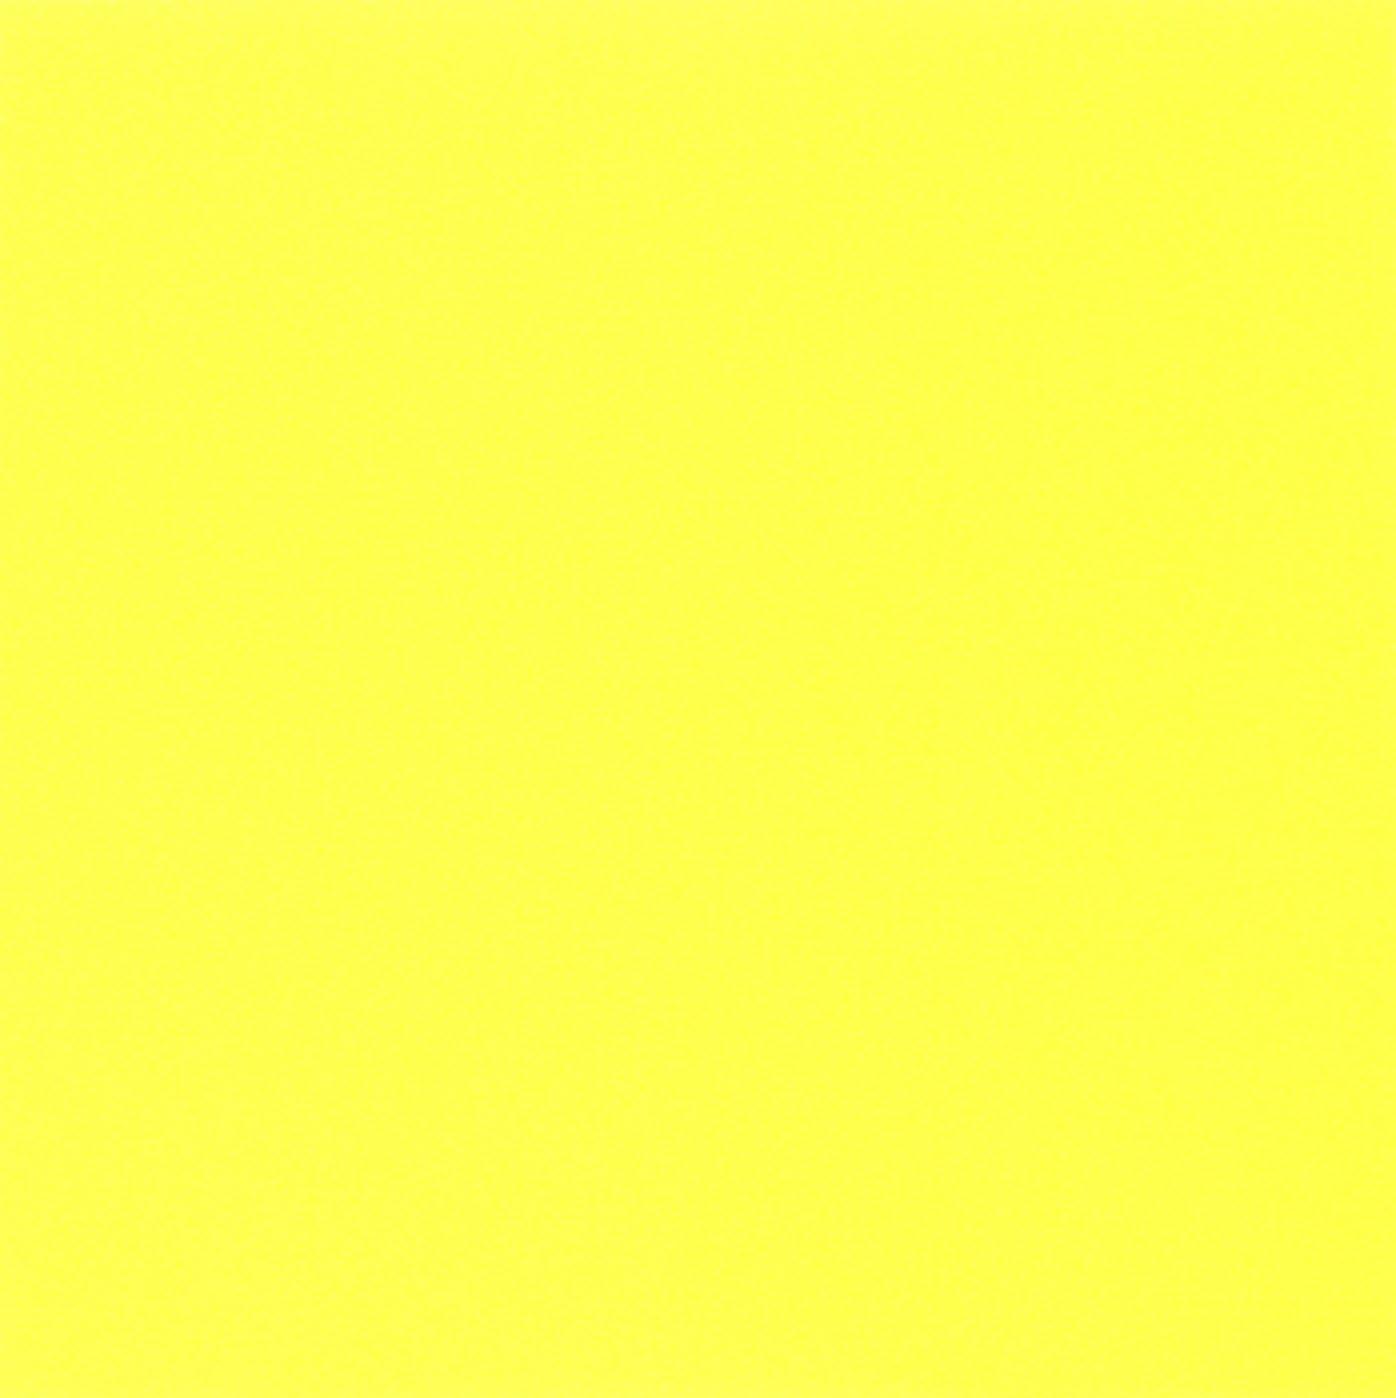 Yellow Origami Paper